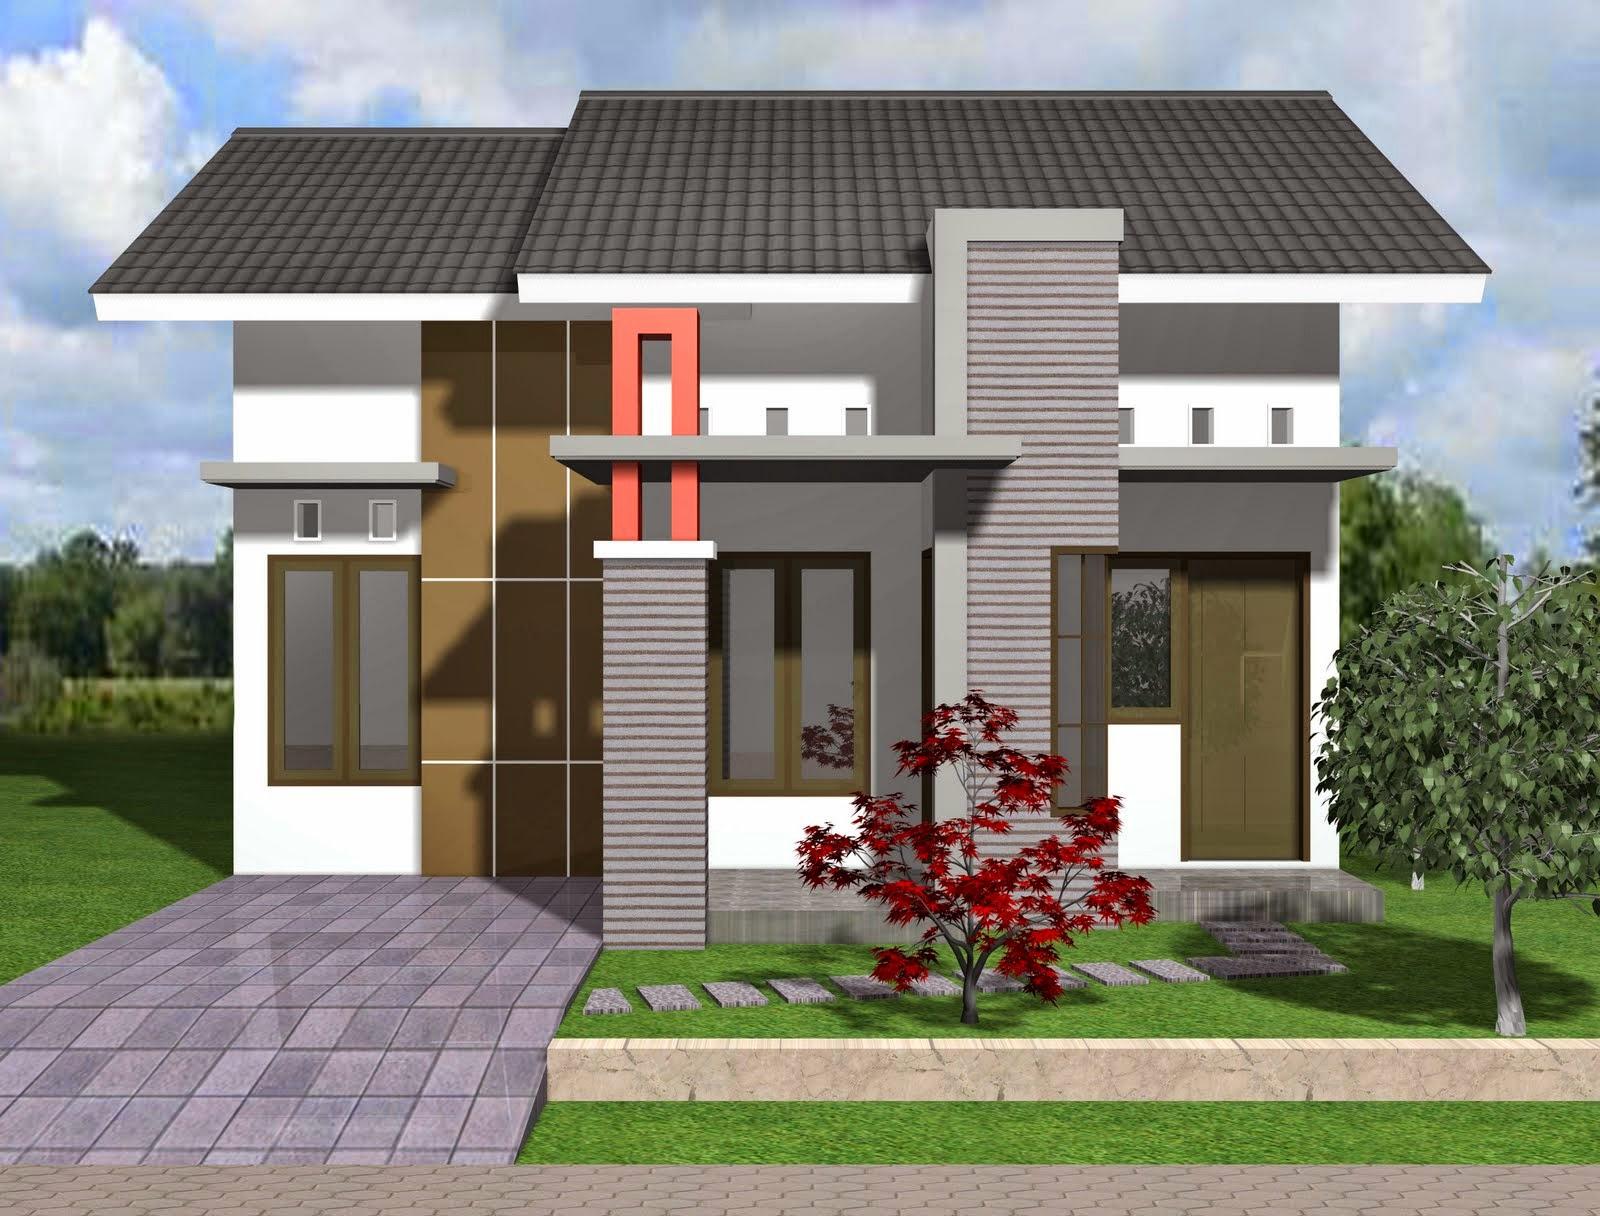 9 desain rumah minimalis type 36 72 paling update